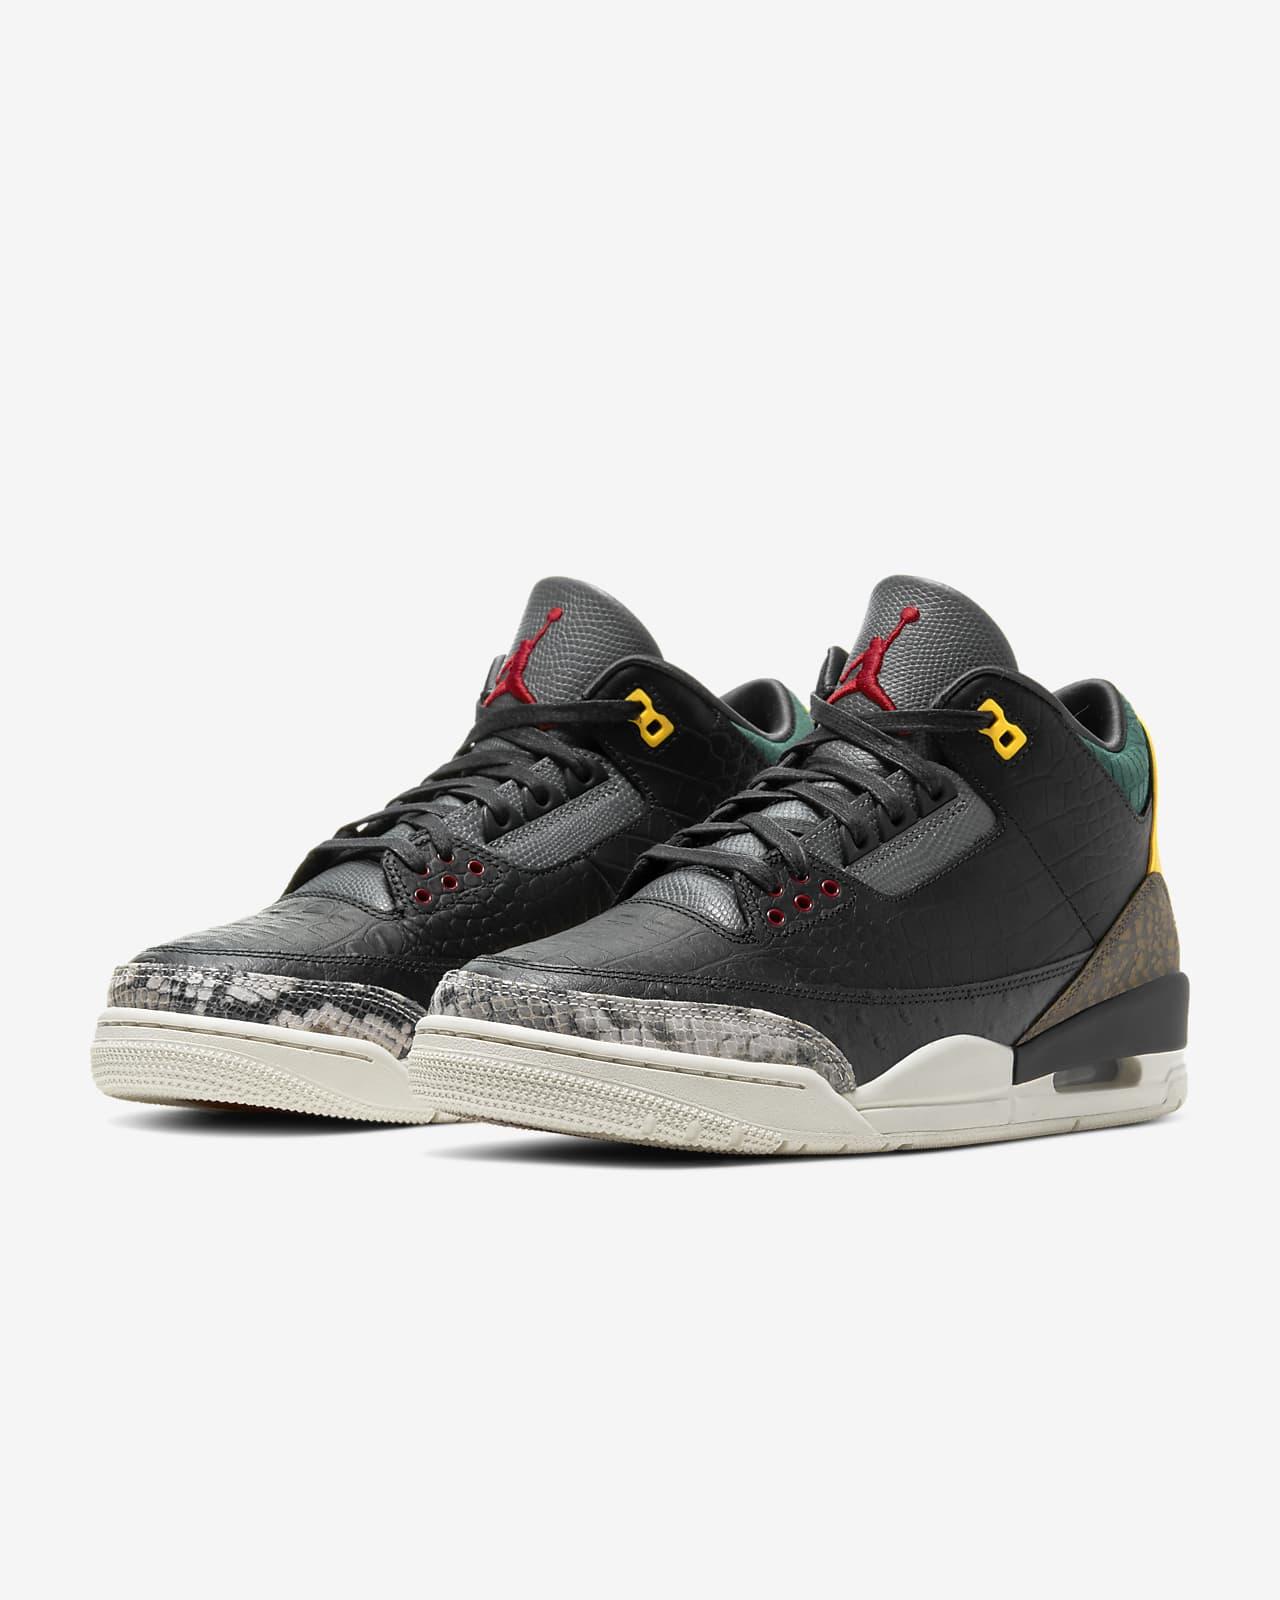 Air Jordan 3 Retro SE Shoe. Nike SG